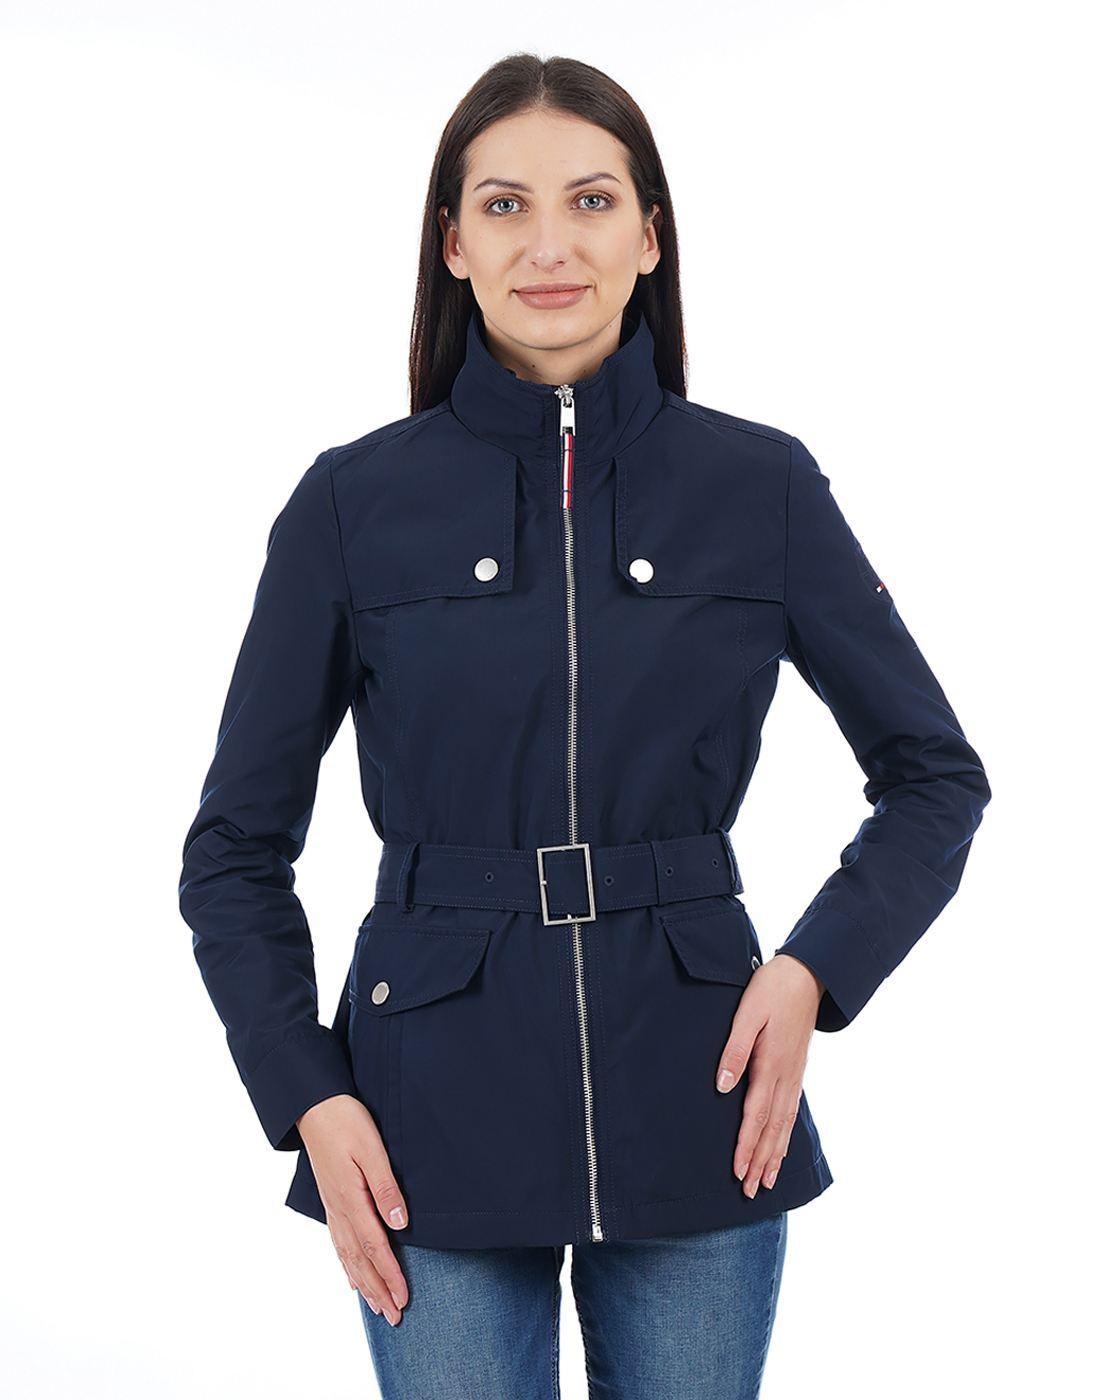 Tommy Hilfiger Women Navy Jacket